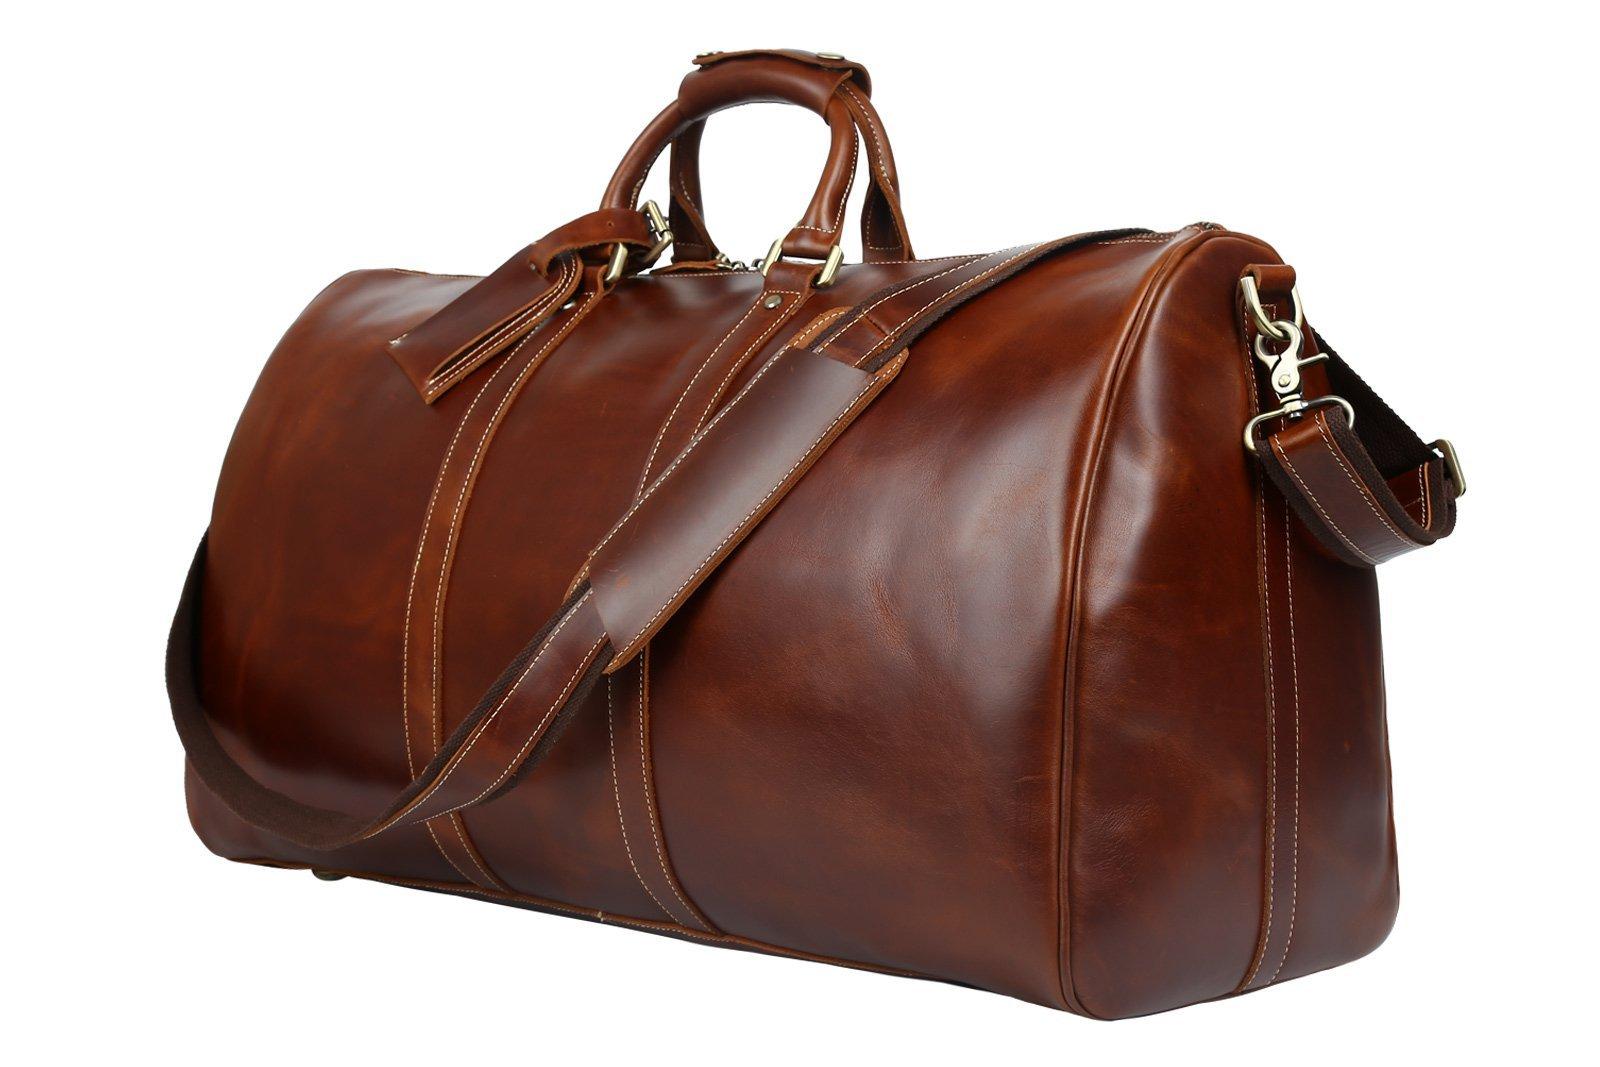 Huntvp Mens Leather Travel Duffel Bag Vintage Weekender Carry On Brown Luggage Bag by Huntvp (Image #1)